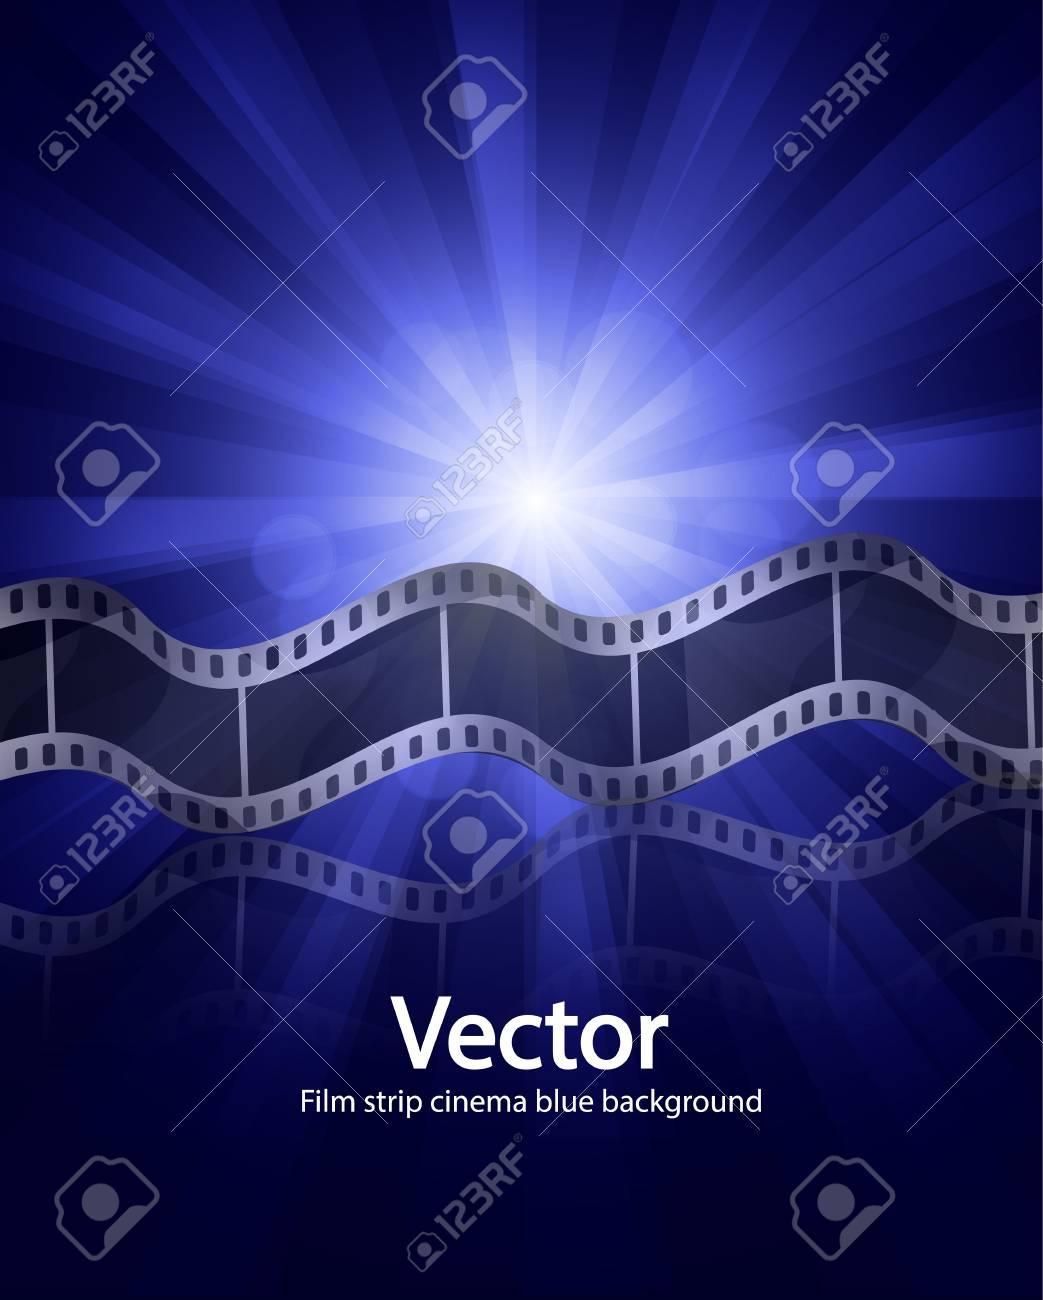 Vector film strip ciinema background Stock Vector - 17827086